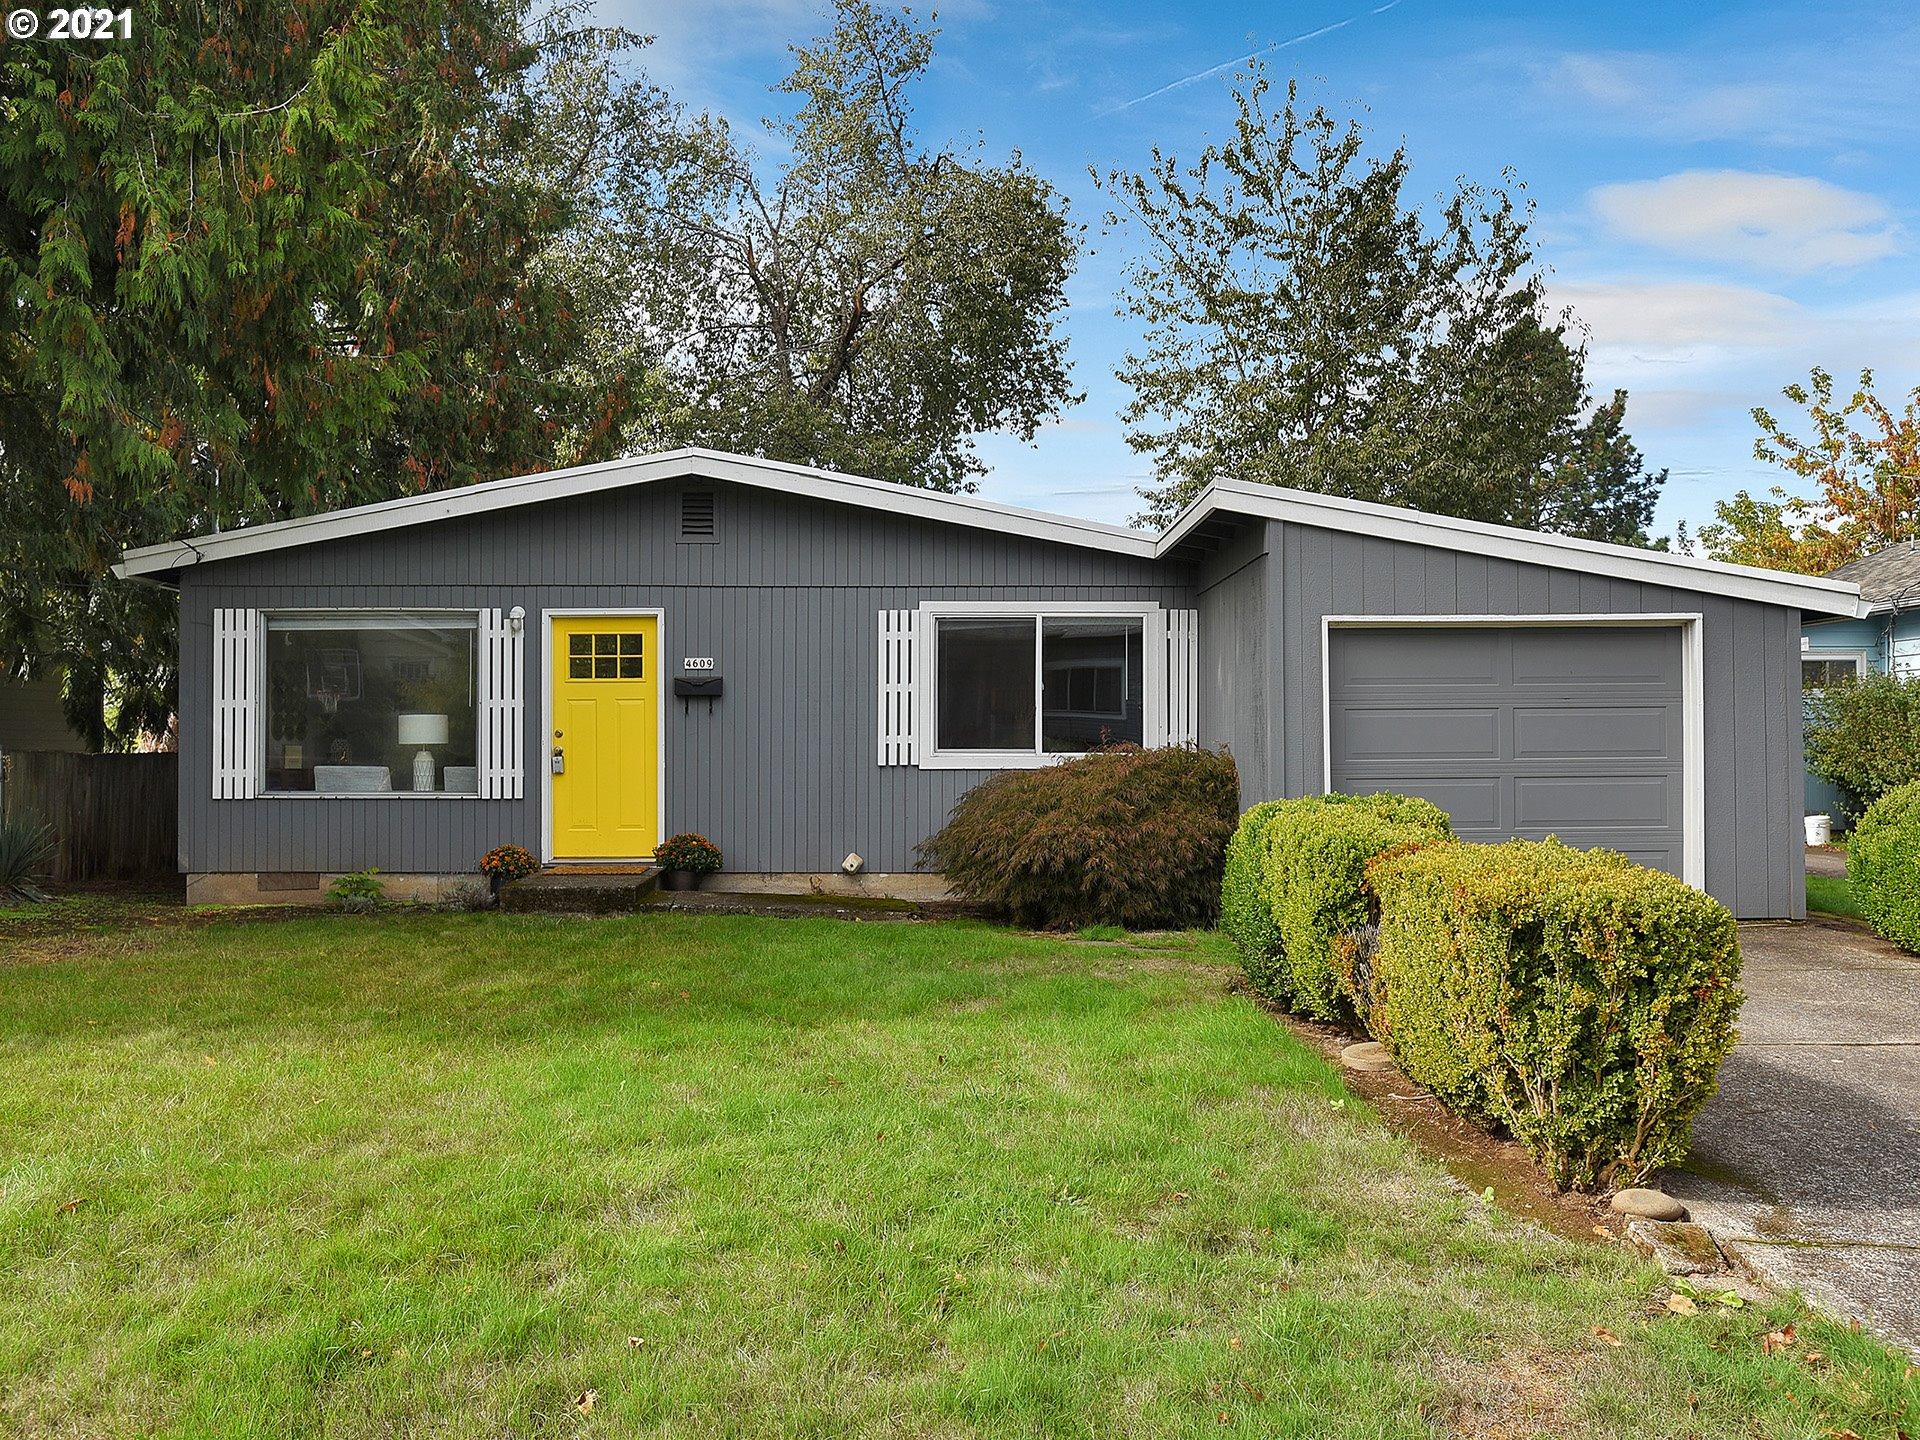 4609 SE 47TH AVE, Portland OR 97206